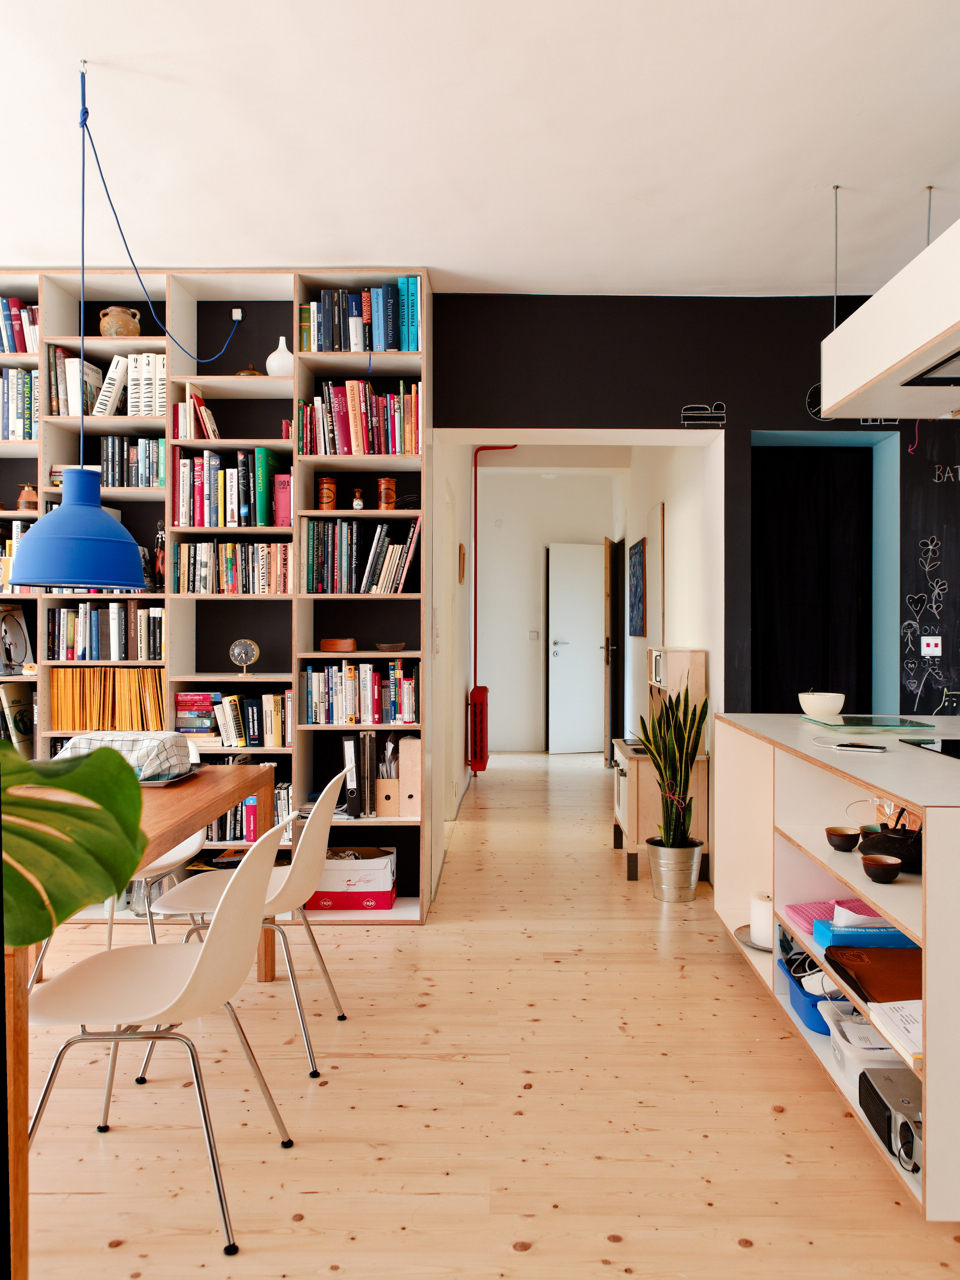 bratislava, slovakia, bookshelf, plywood